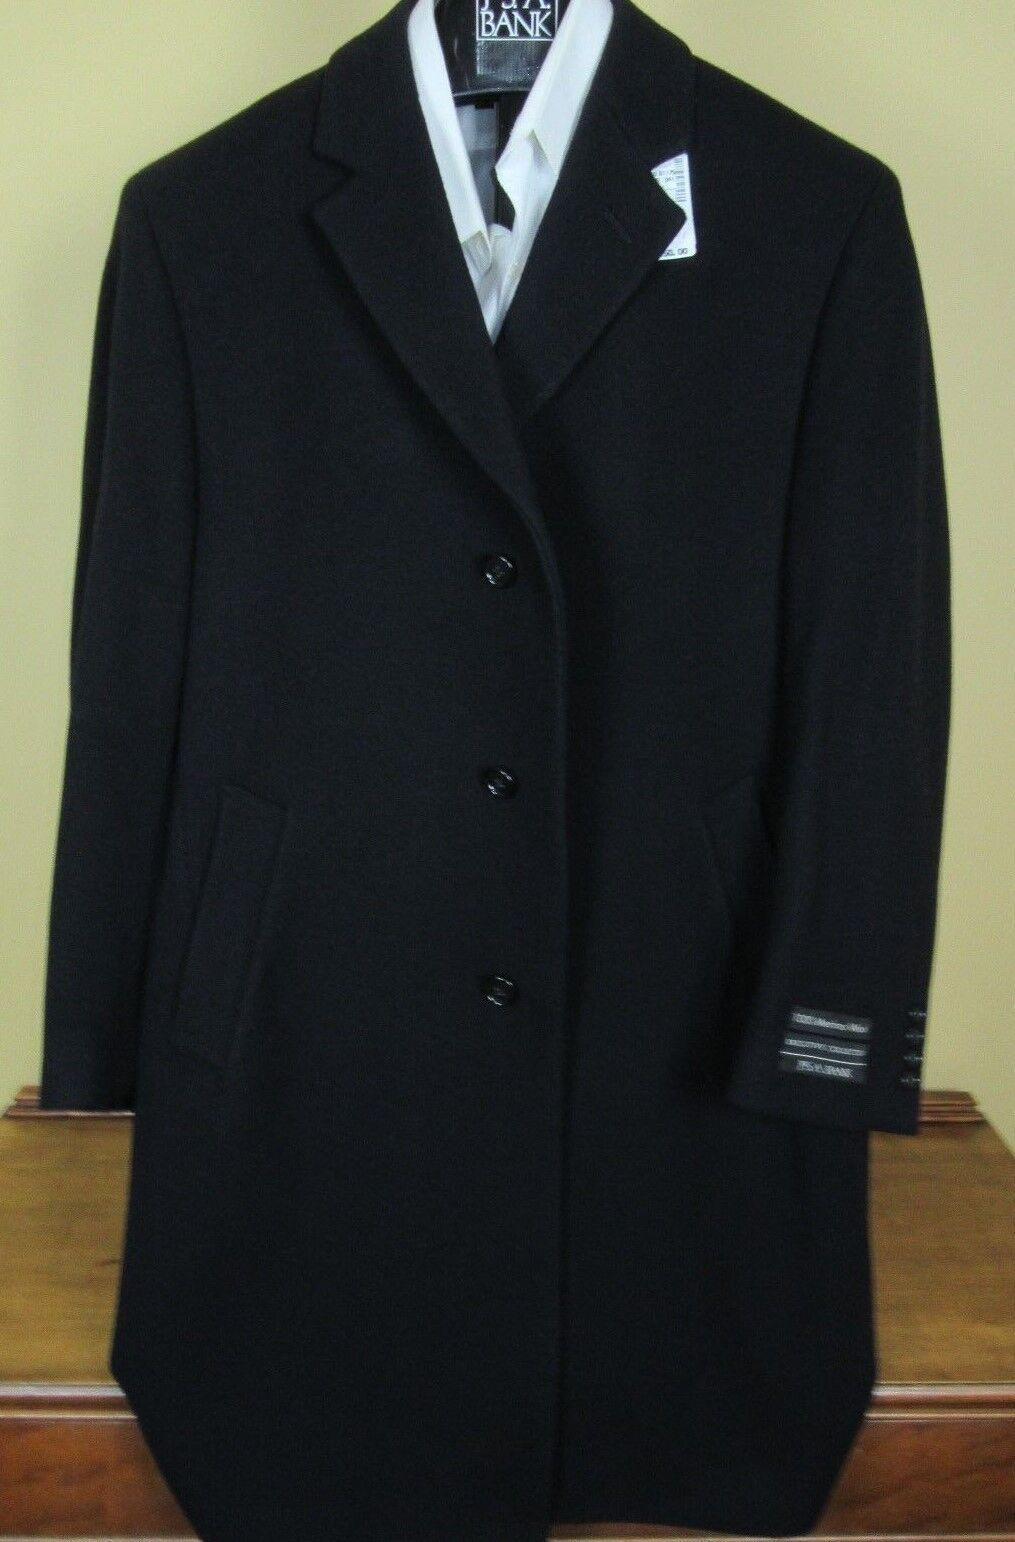 495 New Jos A Bank 100% Merino wool Solid Navy Blau  topcoat  40 S full length